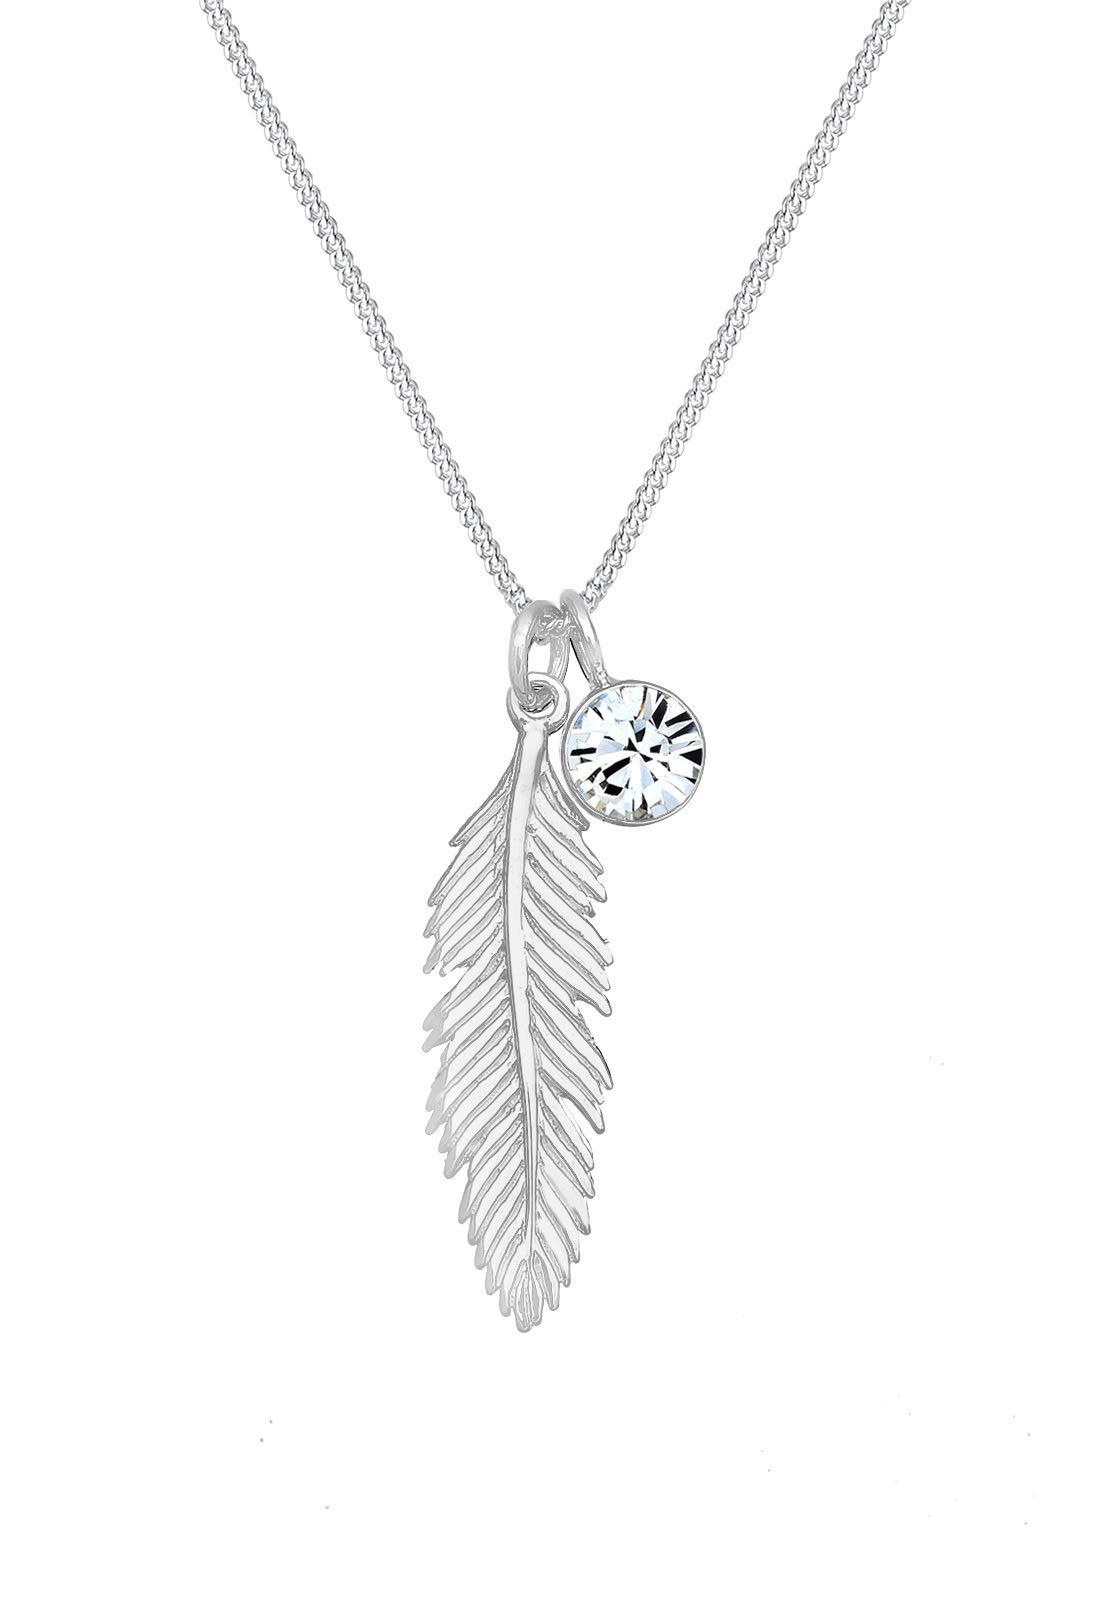 Elli Womens 925 Sterling Silver Xilion Cut Jewellery Necklace